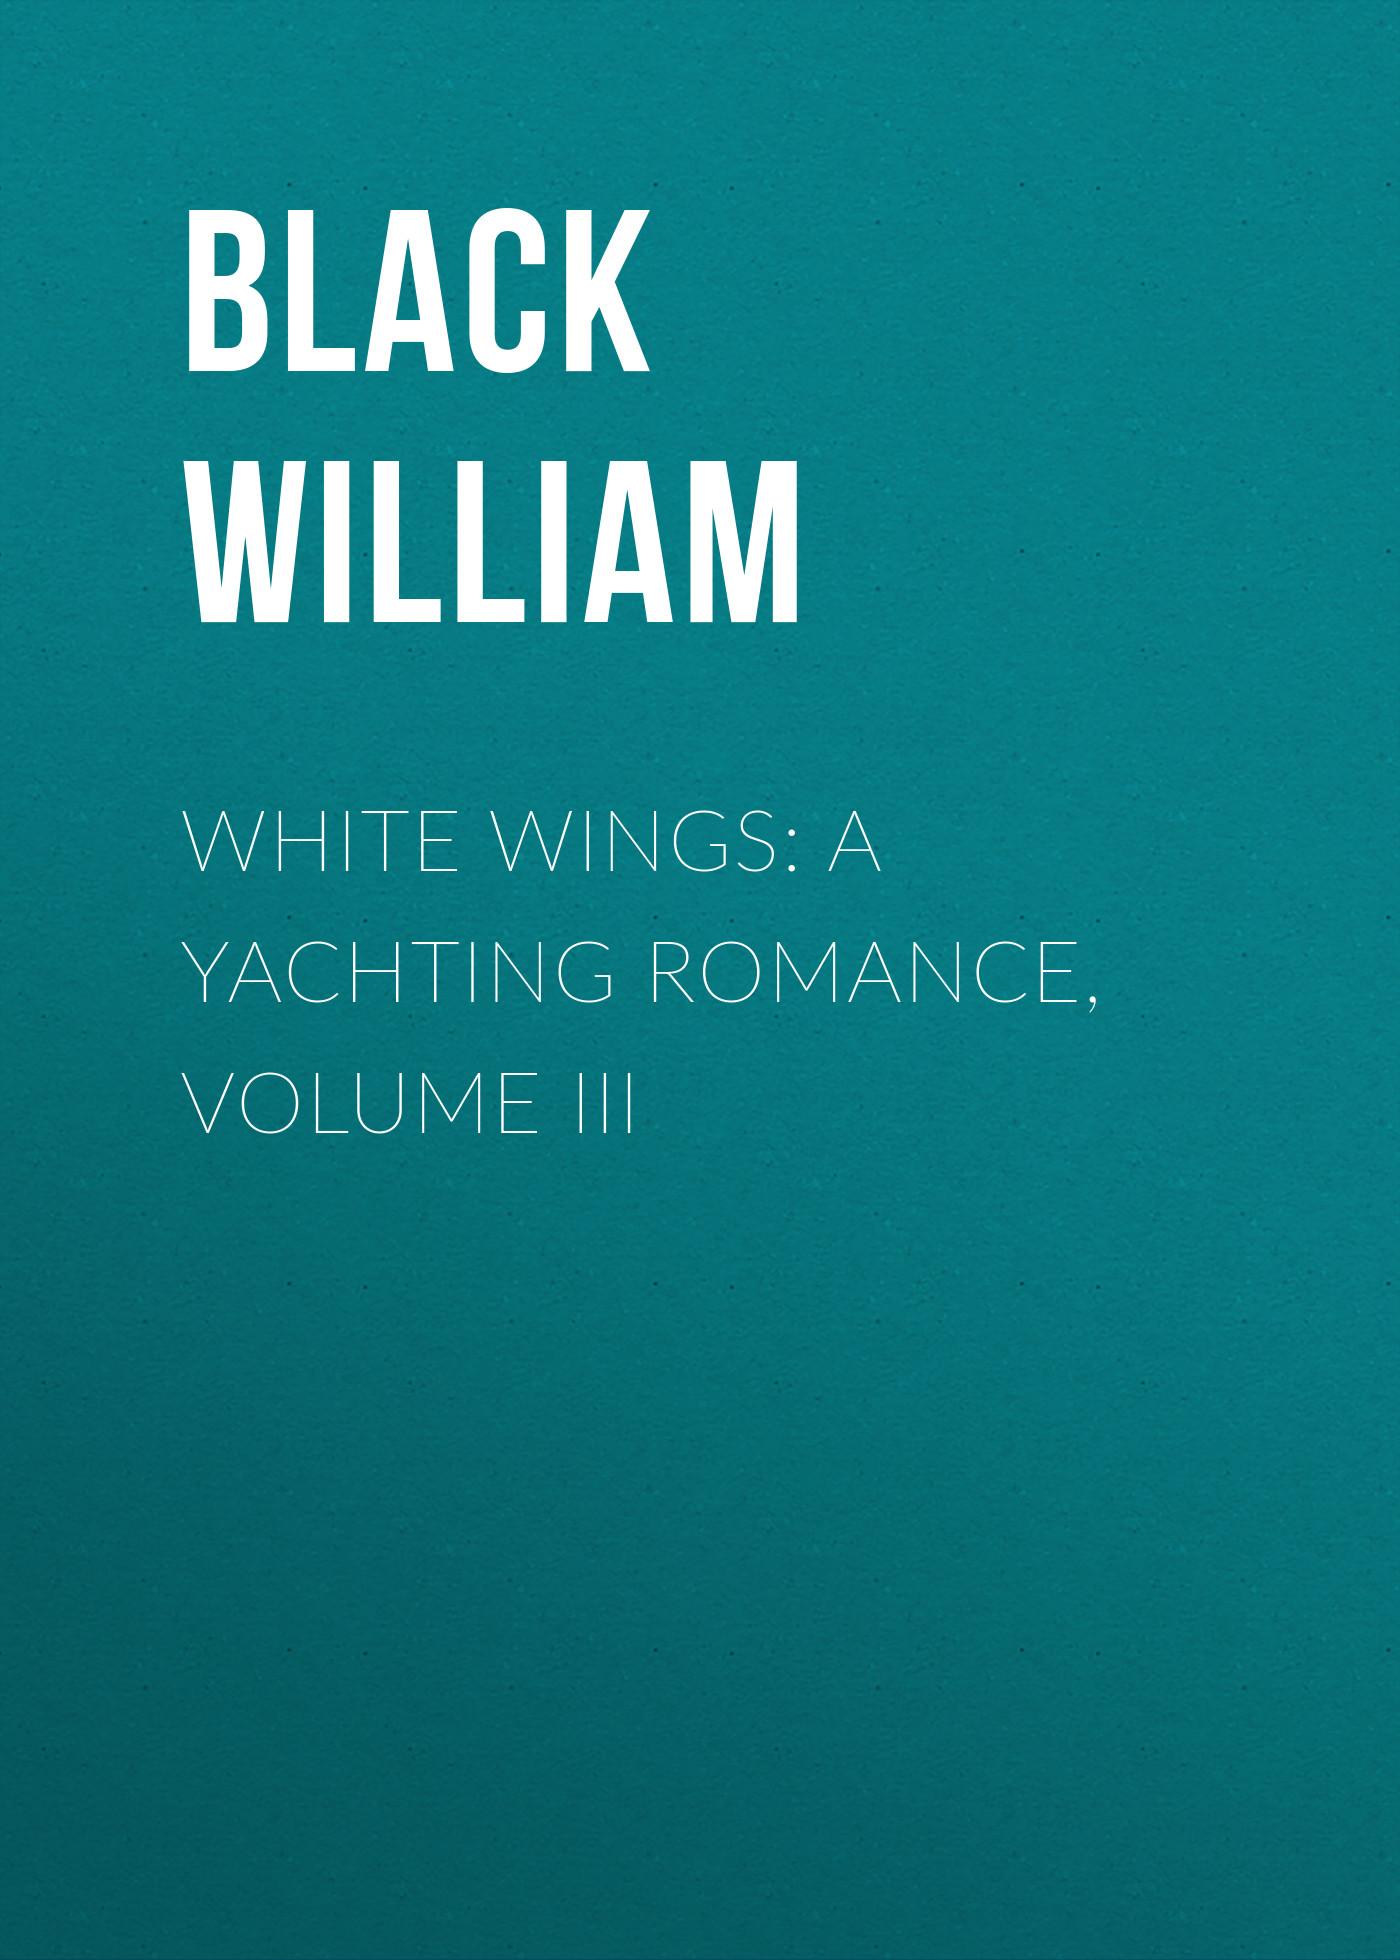 Black William White Wings: A Yachting Romance, Volume III niko white black font 1 volume